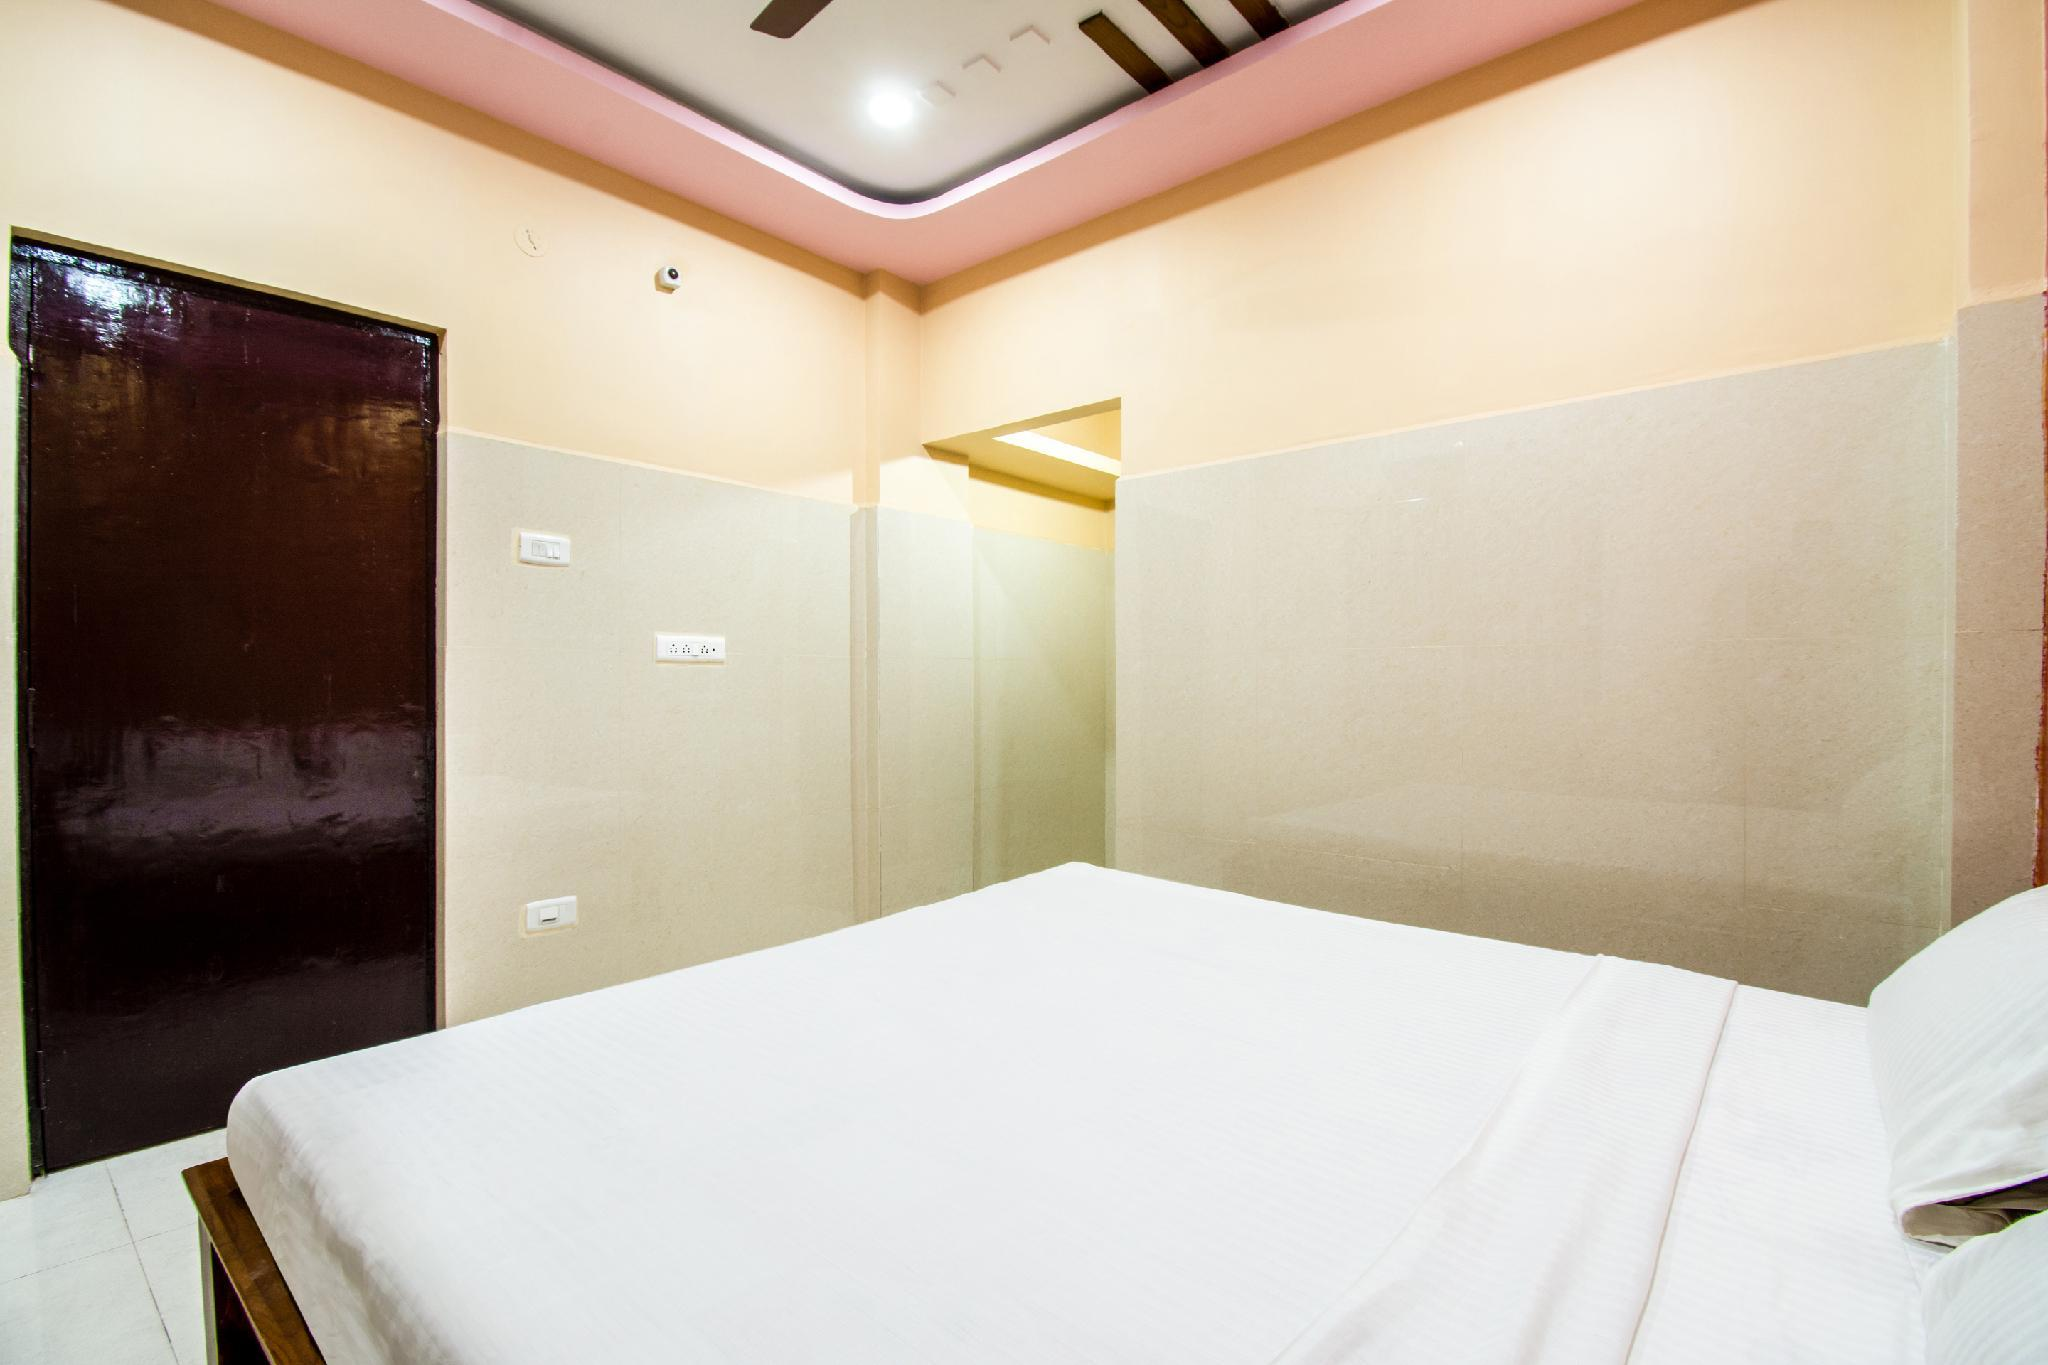 SPOT ON 15830 Ssg Residency